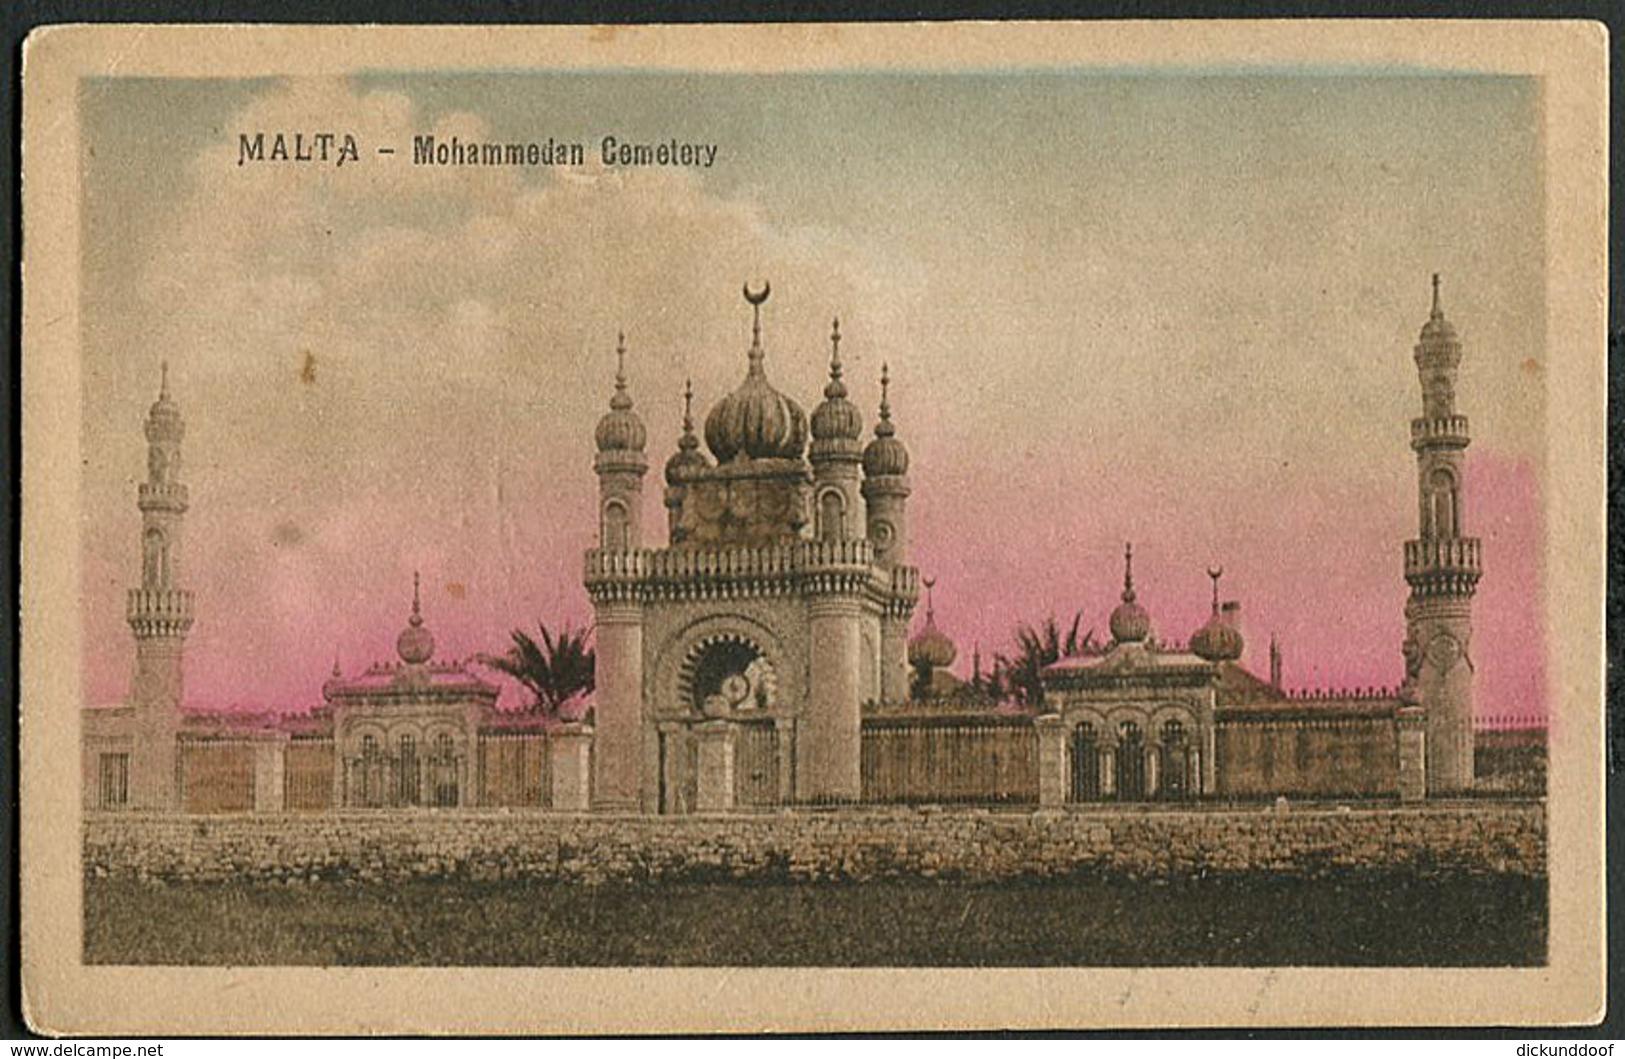 Malta - Mohammedan Cemetery - Malte